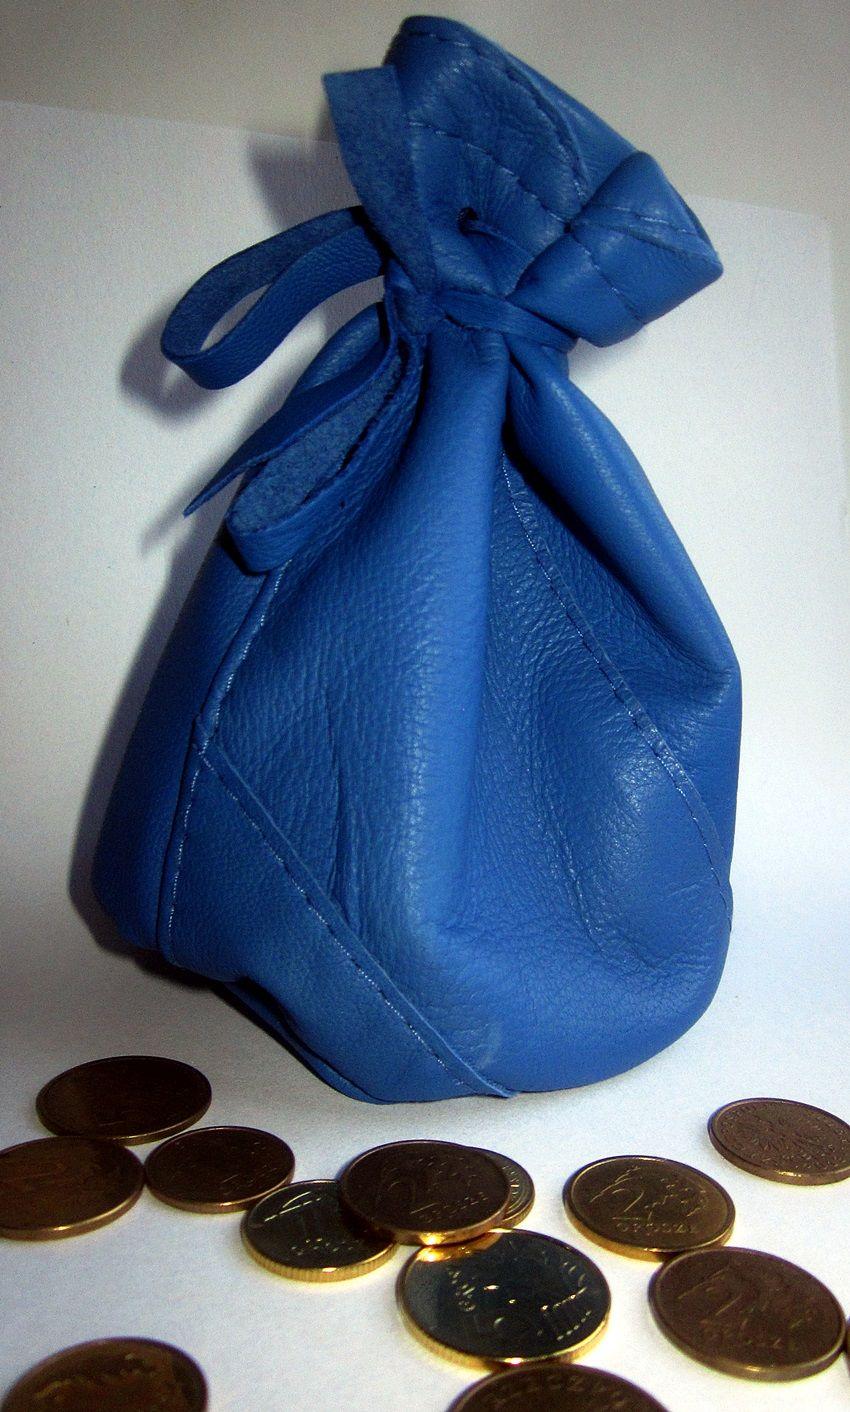 Sakiewka Mieszek Portfel Na Monety Skora Naturalna 8314291407 Oficjalne Archiwum Allegro Body Fashion Backpack Backpacks